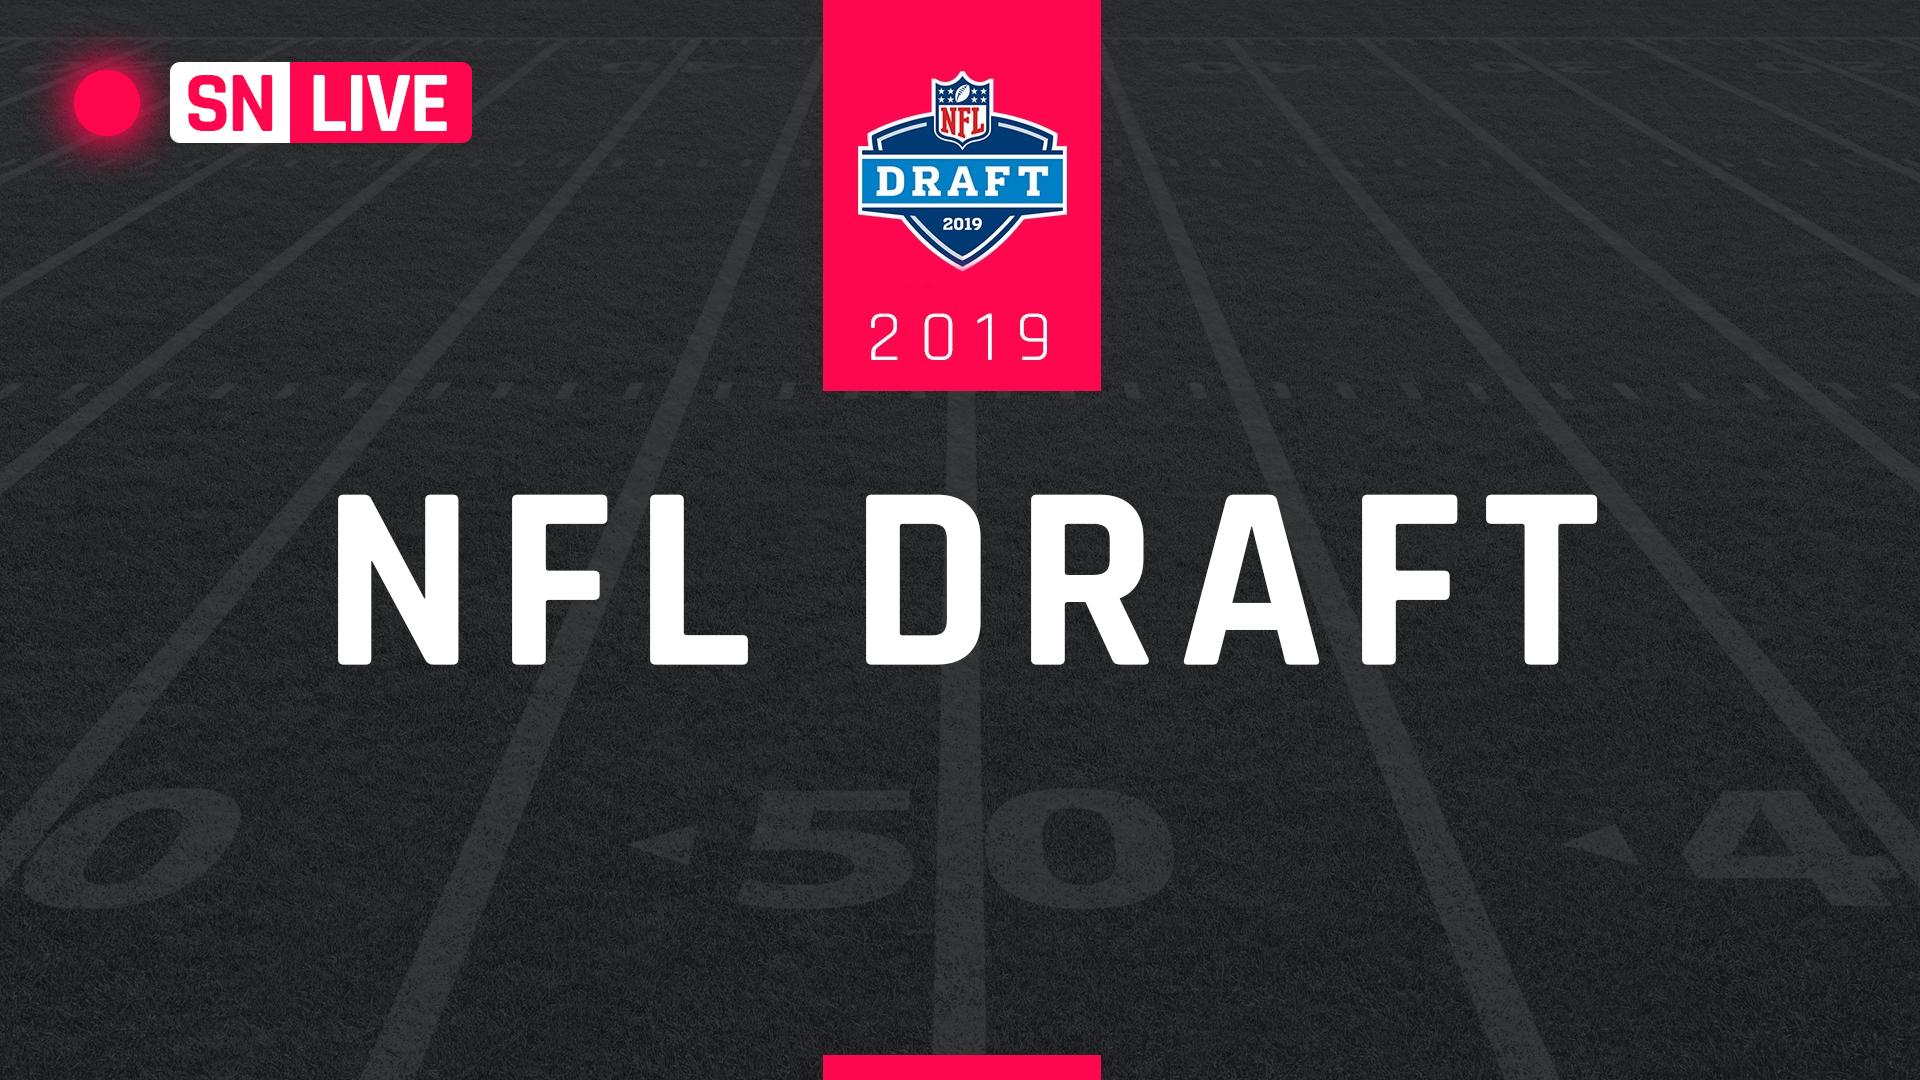 watch nfl draft live online free